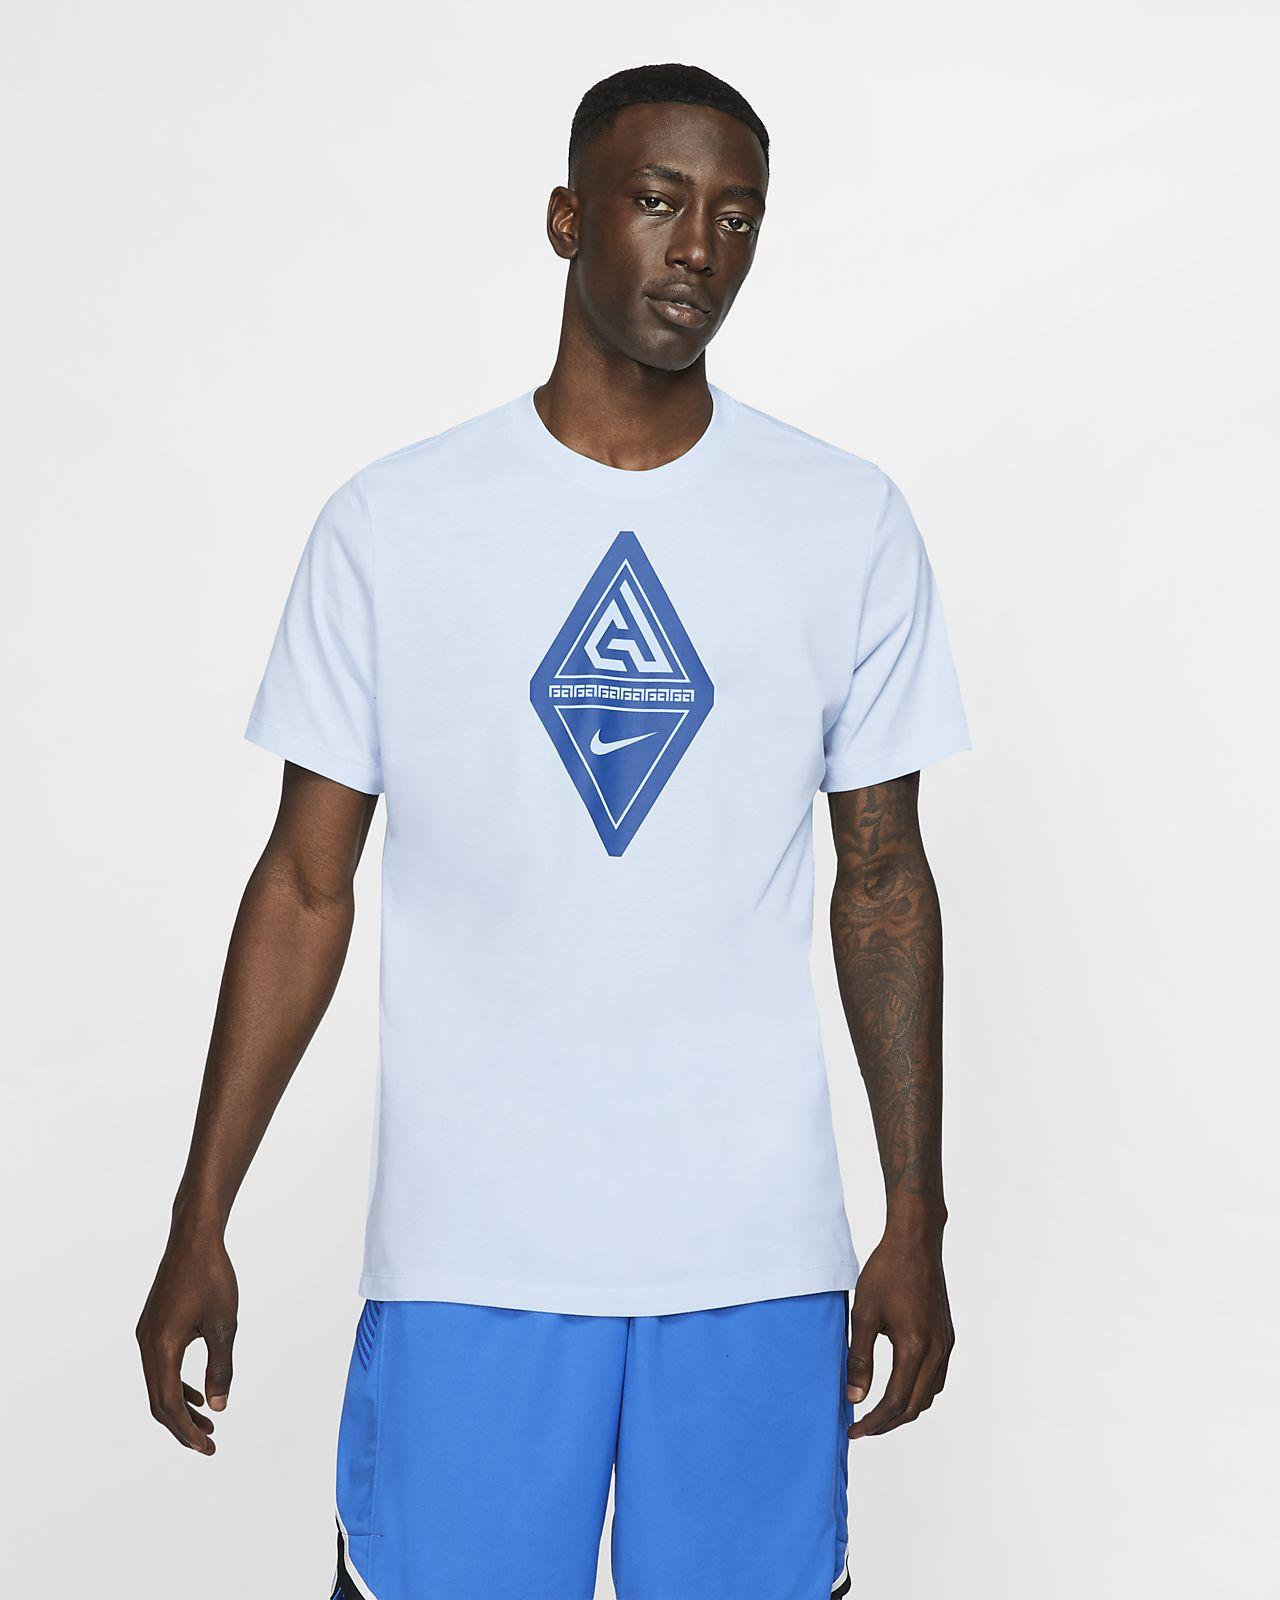 Giannis Nike Dri-FIT Basketbalshirt met logo voor heren